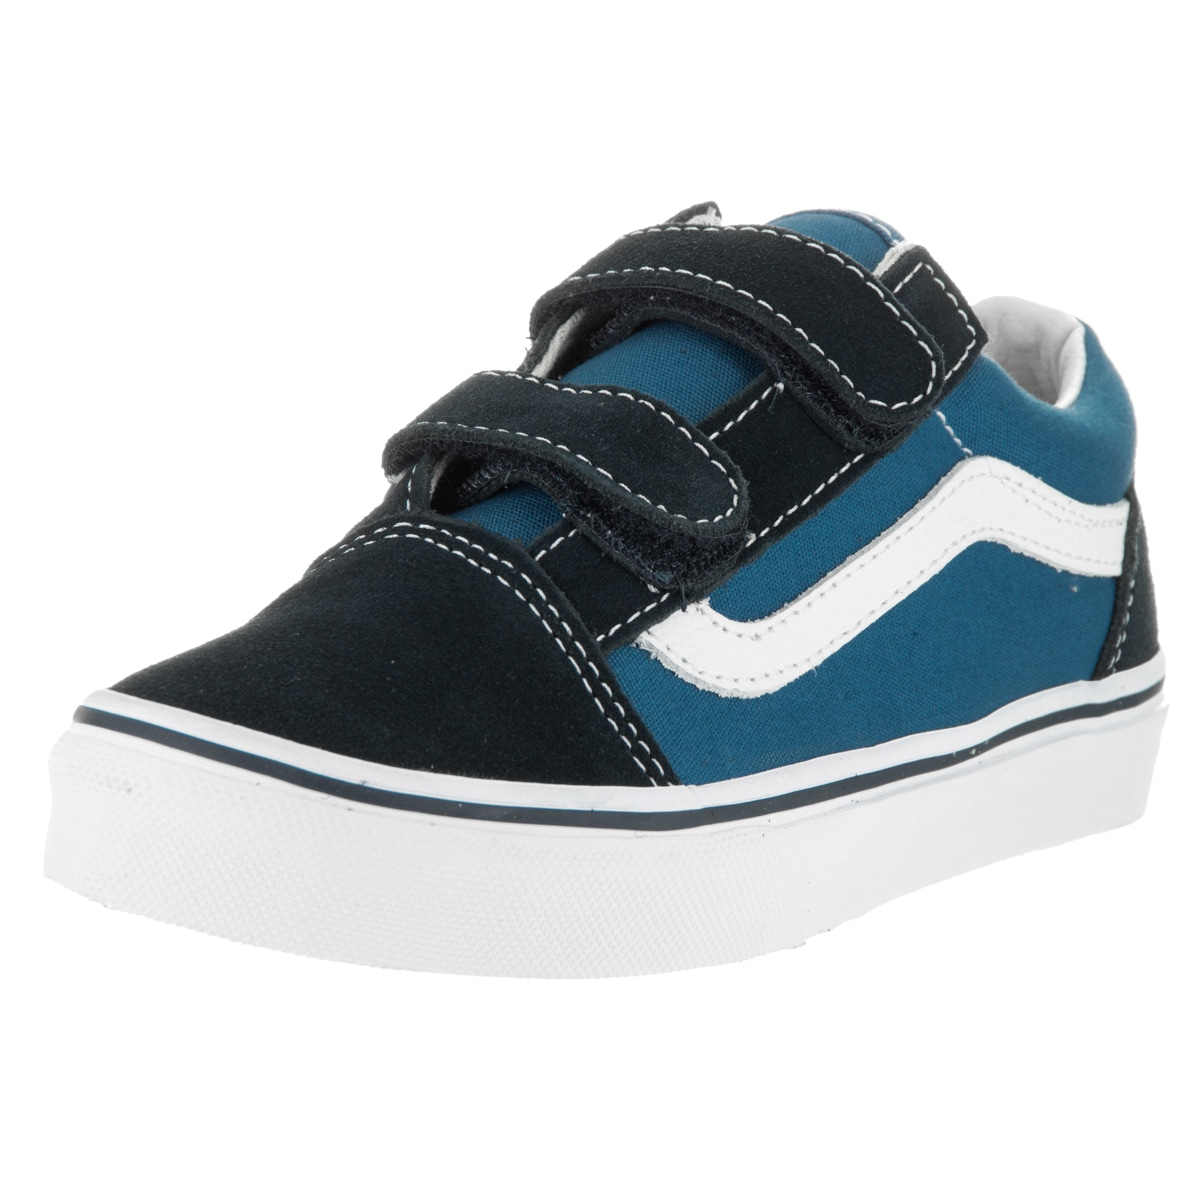 Shop Vans Kids Old Skool V Navy/True